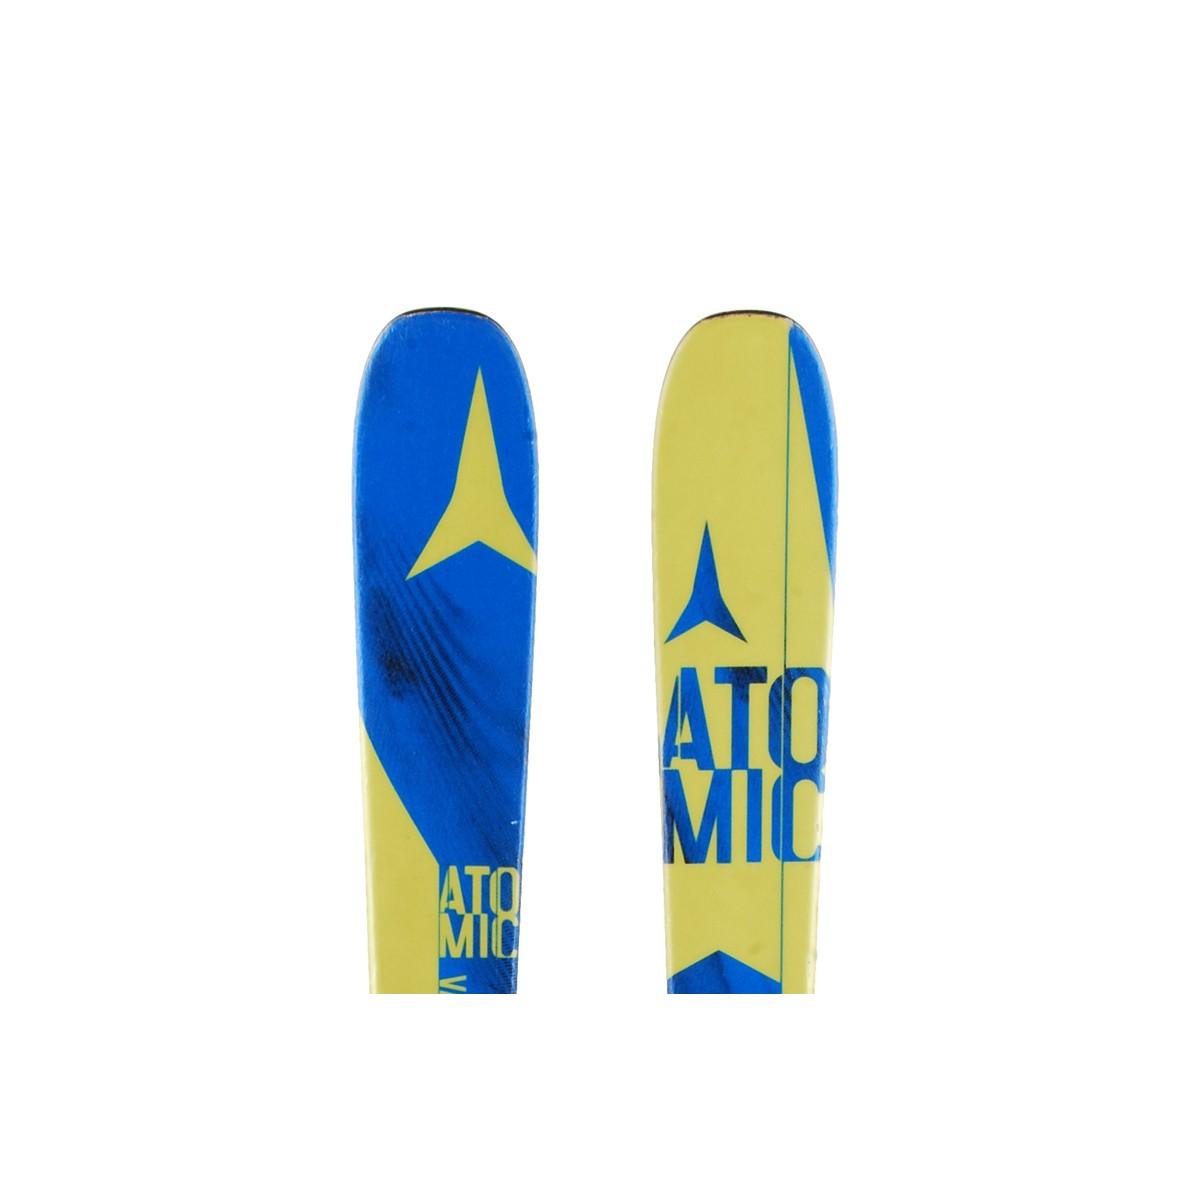 Ski-Atomic-Vantage-83R-occasion-fixations miniature 7